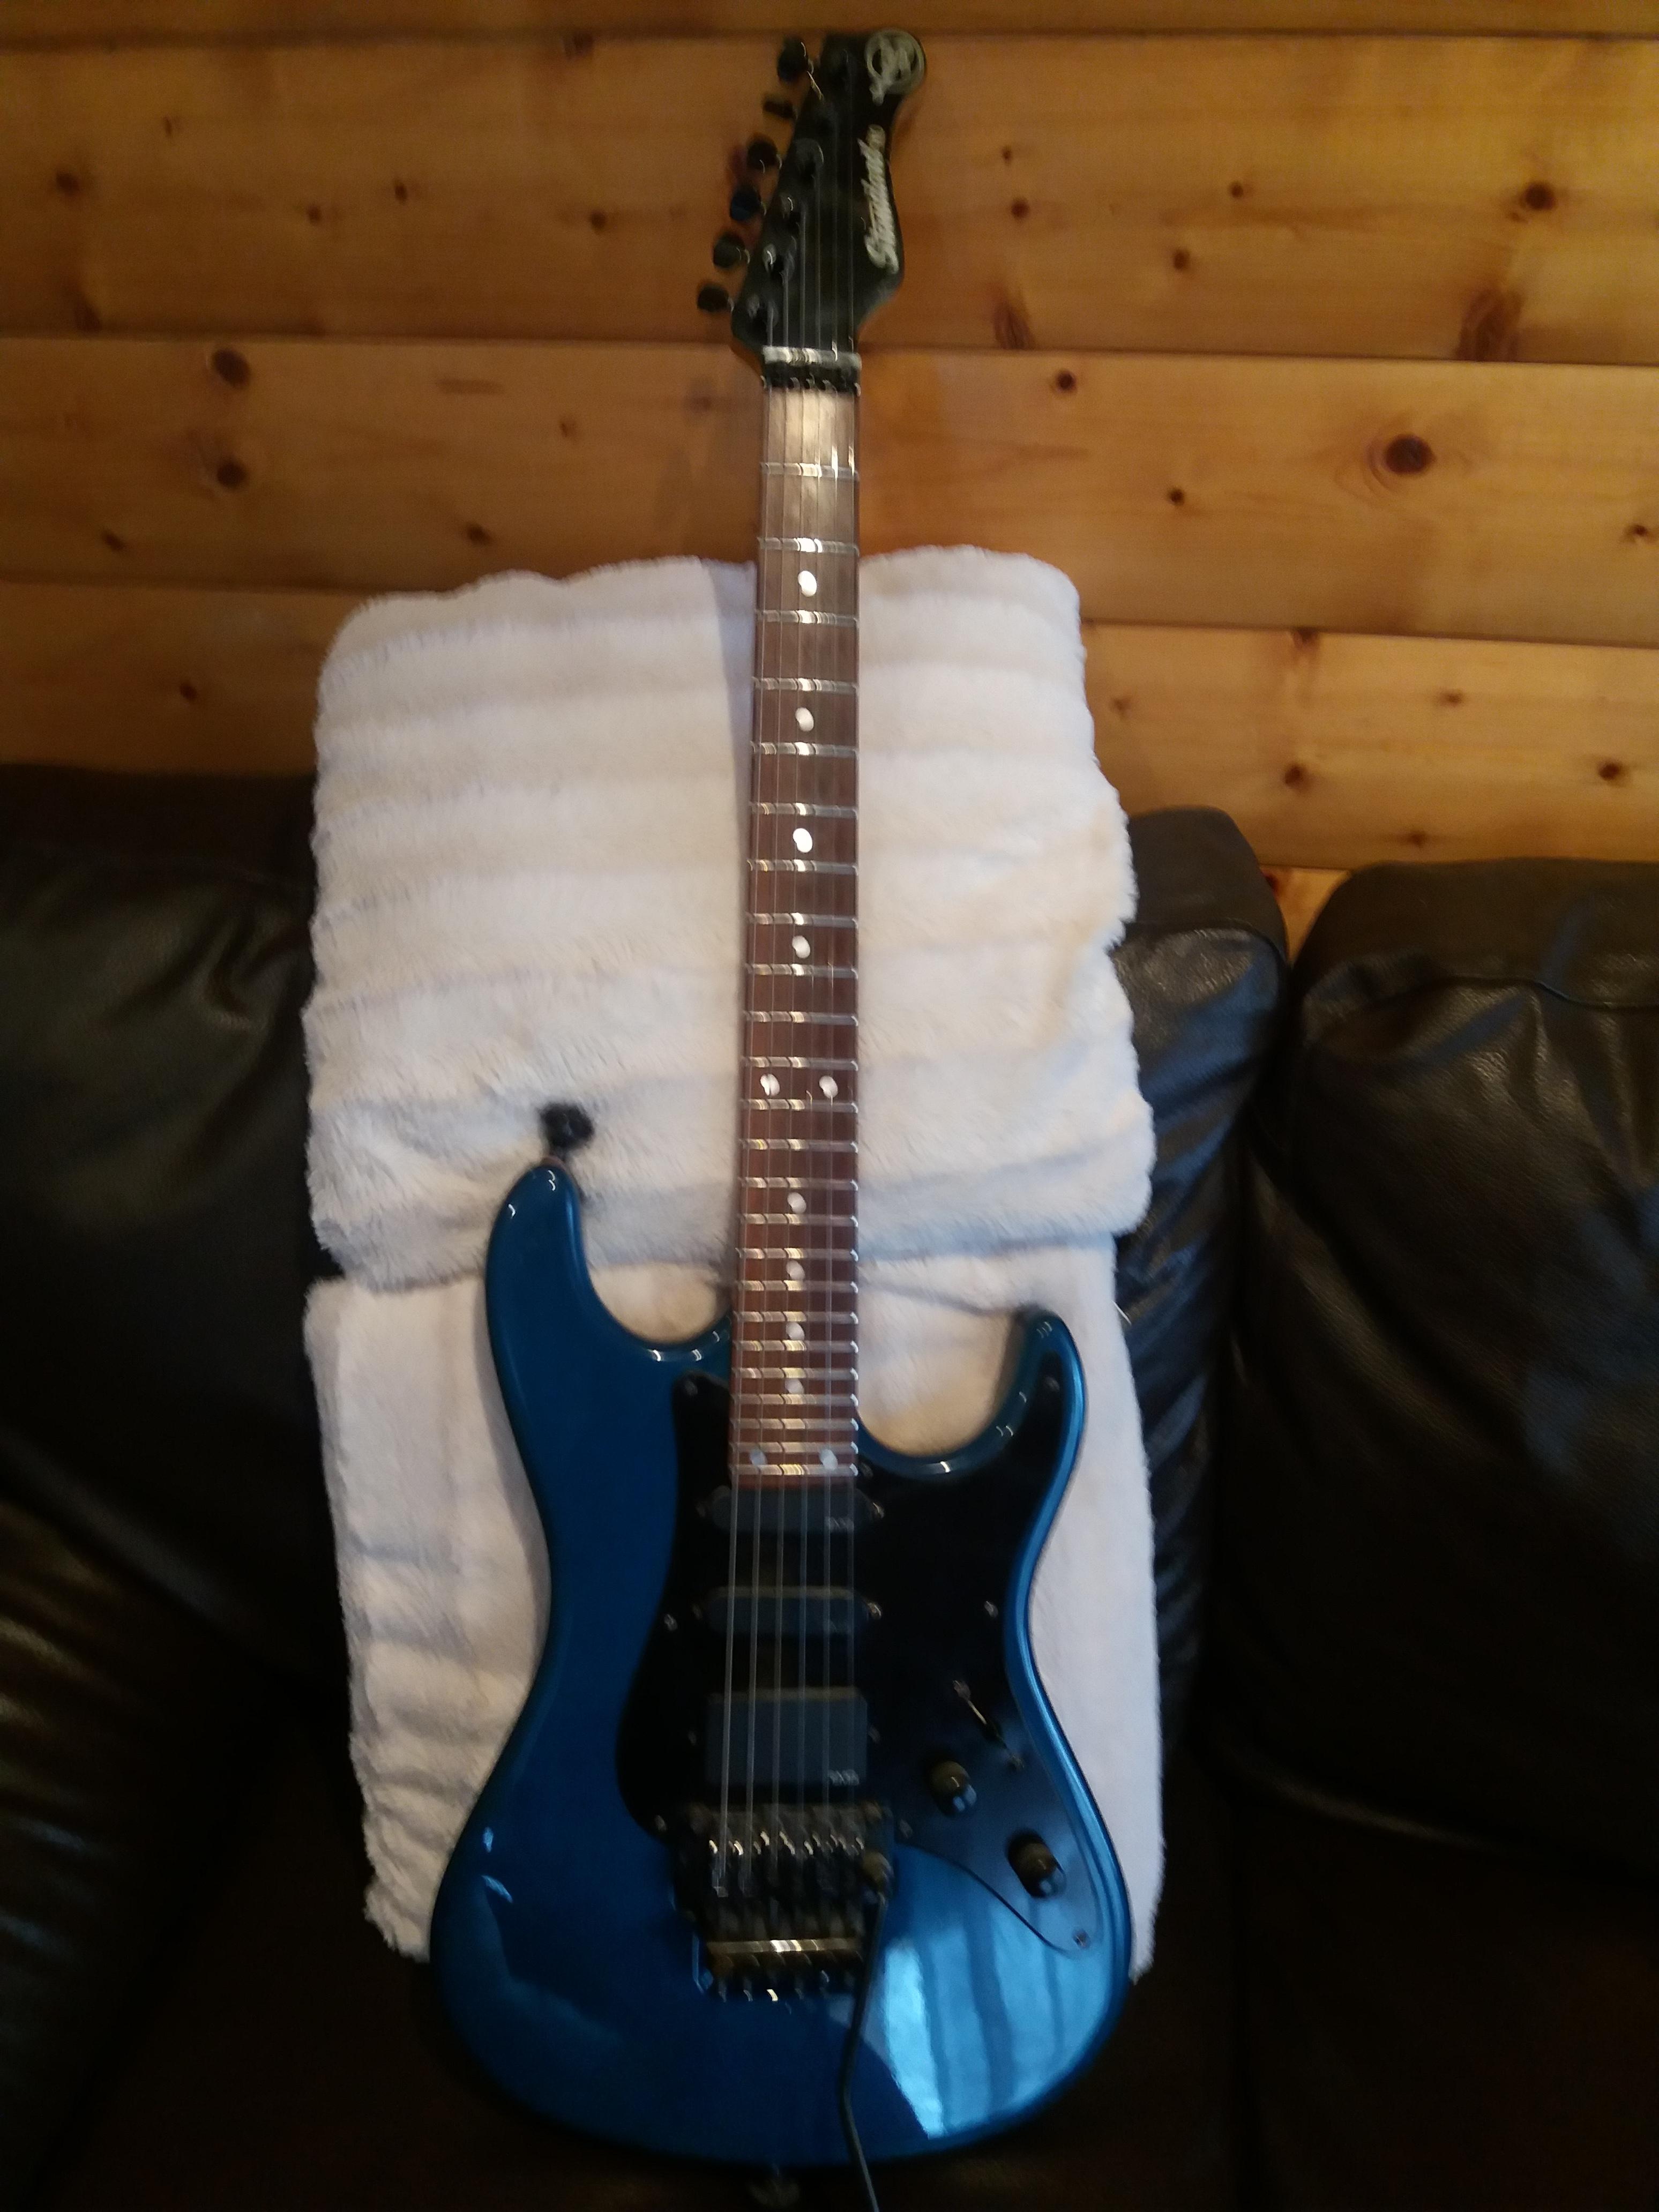 valley arts guitars standard pro image 1660778 audiofanzine. Black Bedroom Furniture Sets. Home Design Ideas